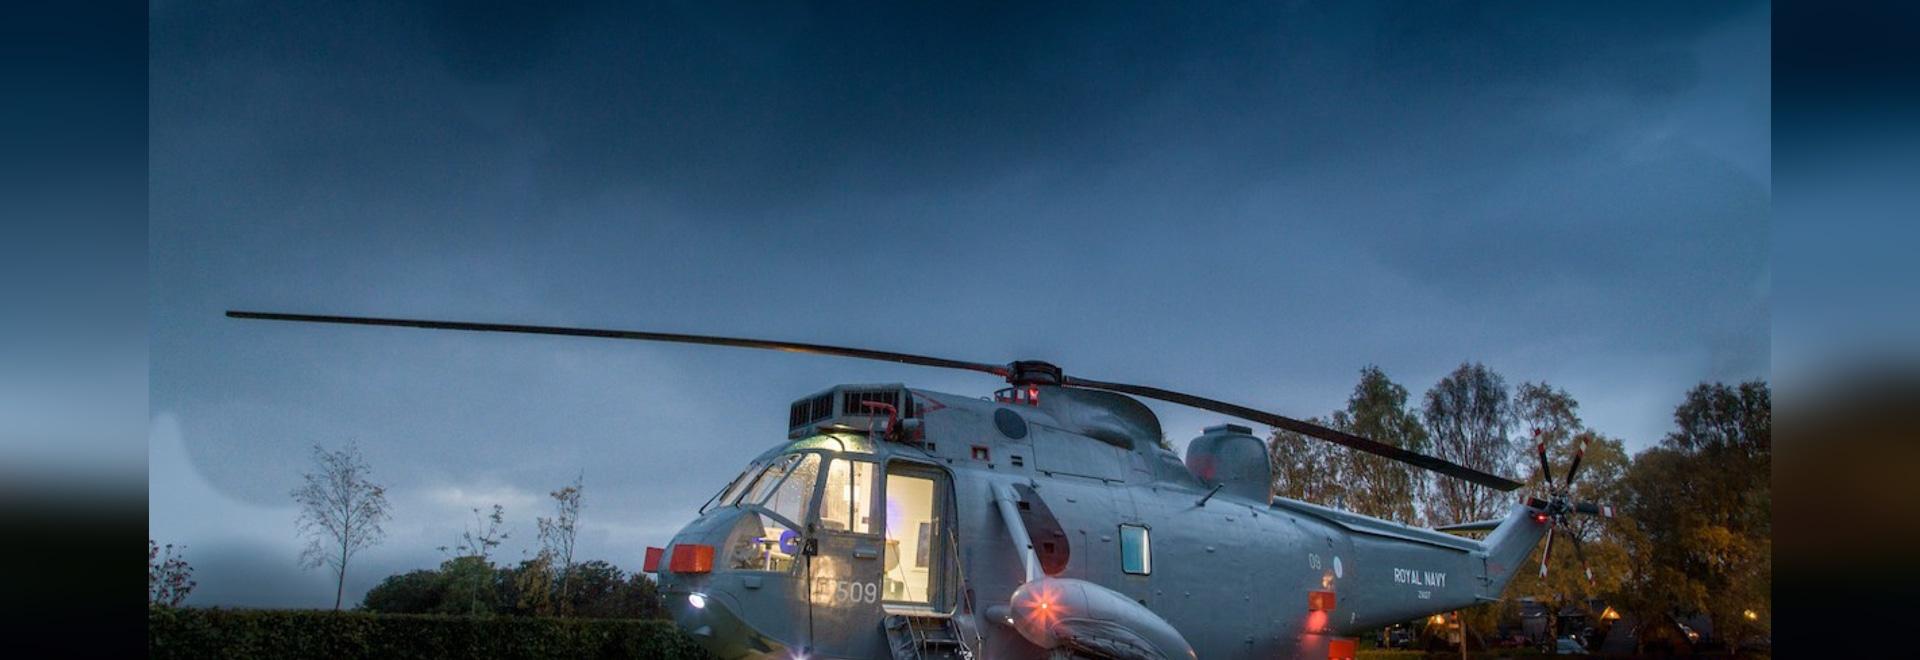 Elicottero 8 : Professionale rc drone elicottero w  g ghz fpv lega